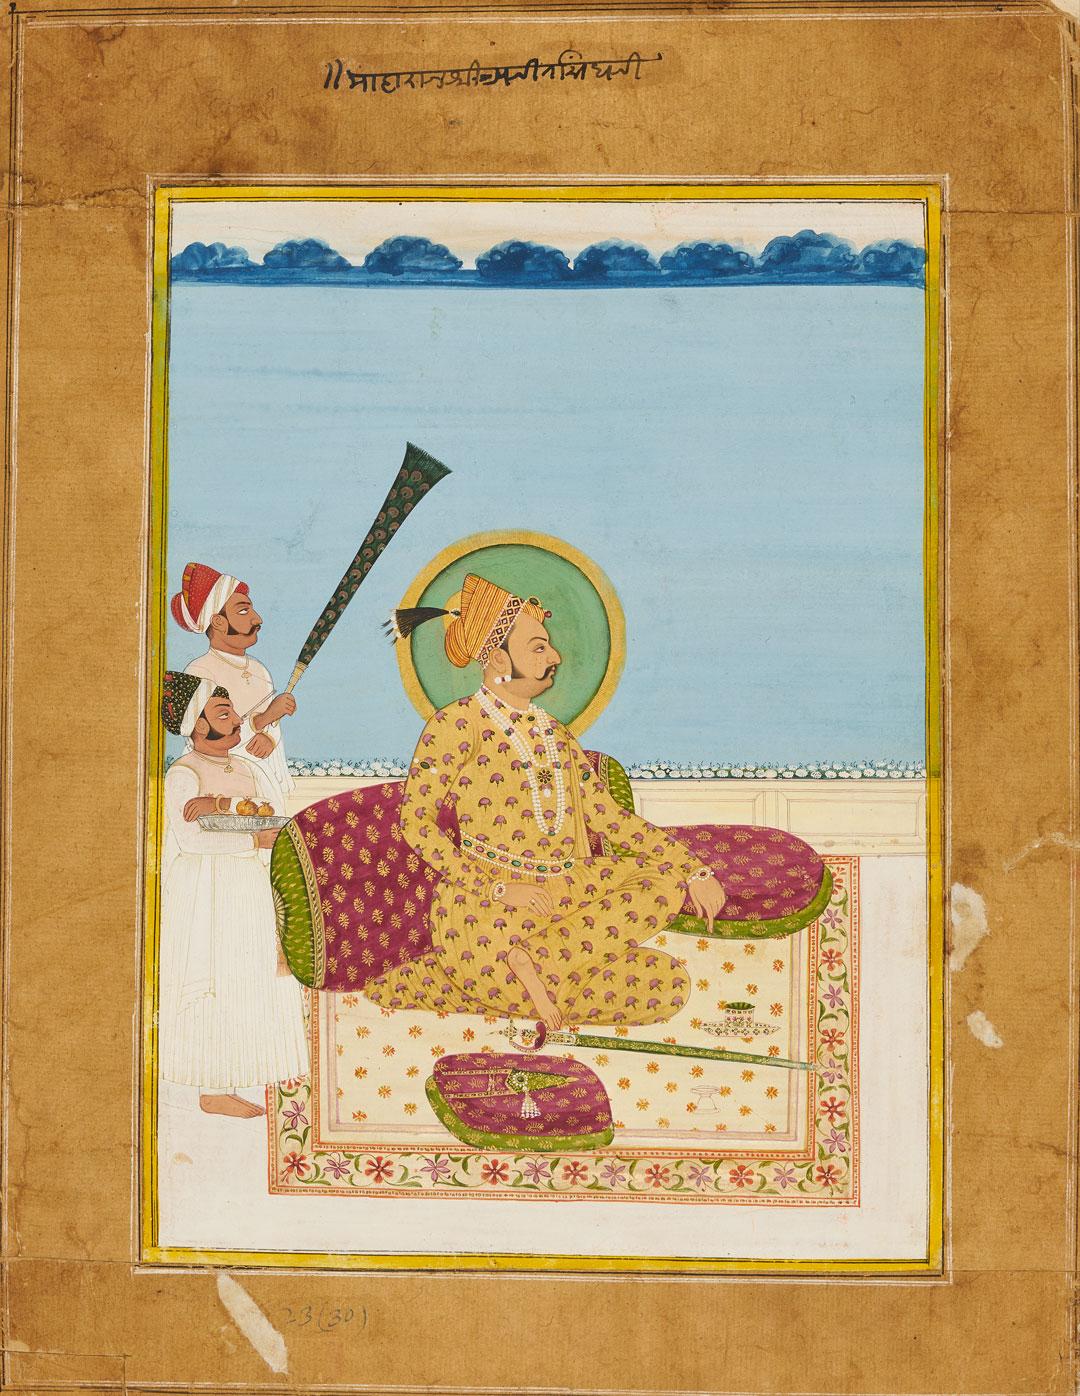 Portrait of Maharaja Ajit Singh, ca. 1830